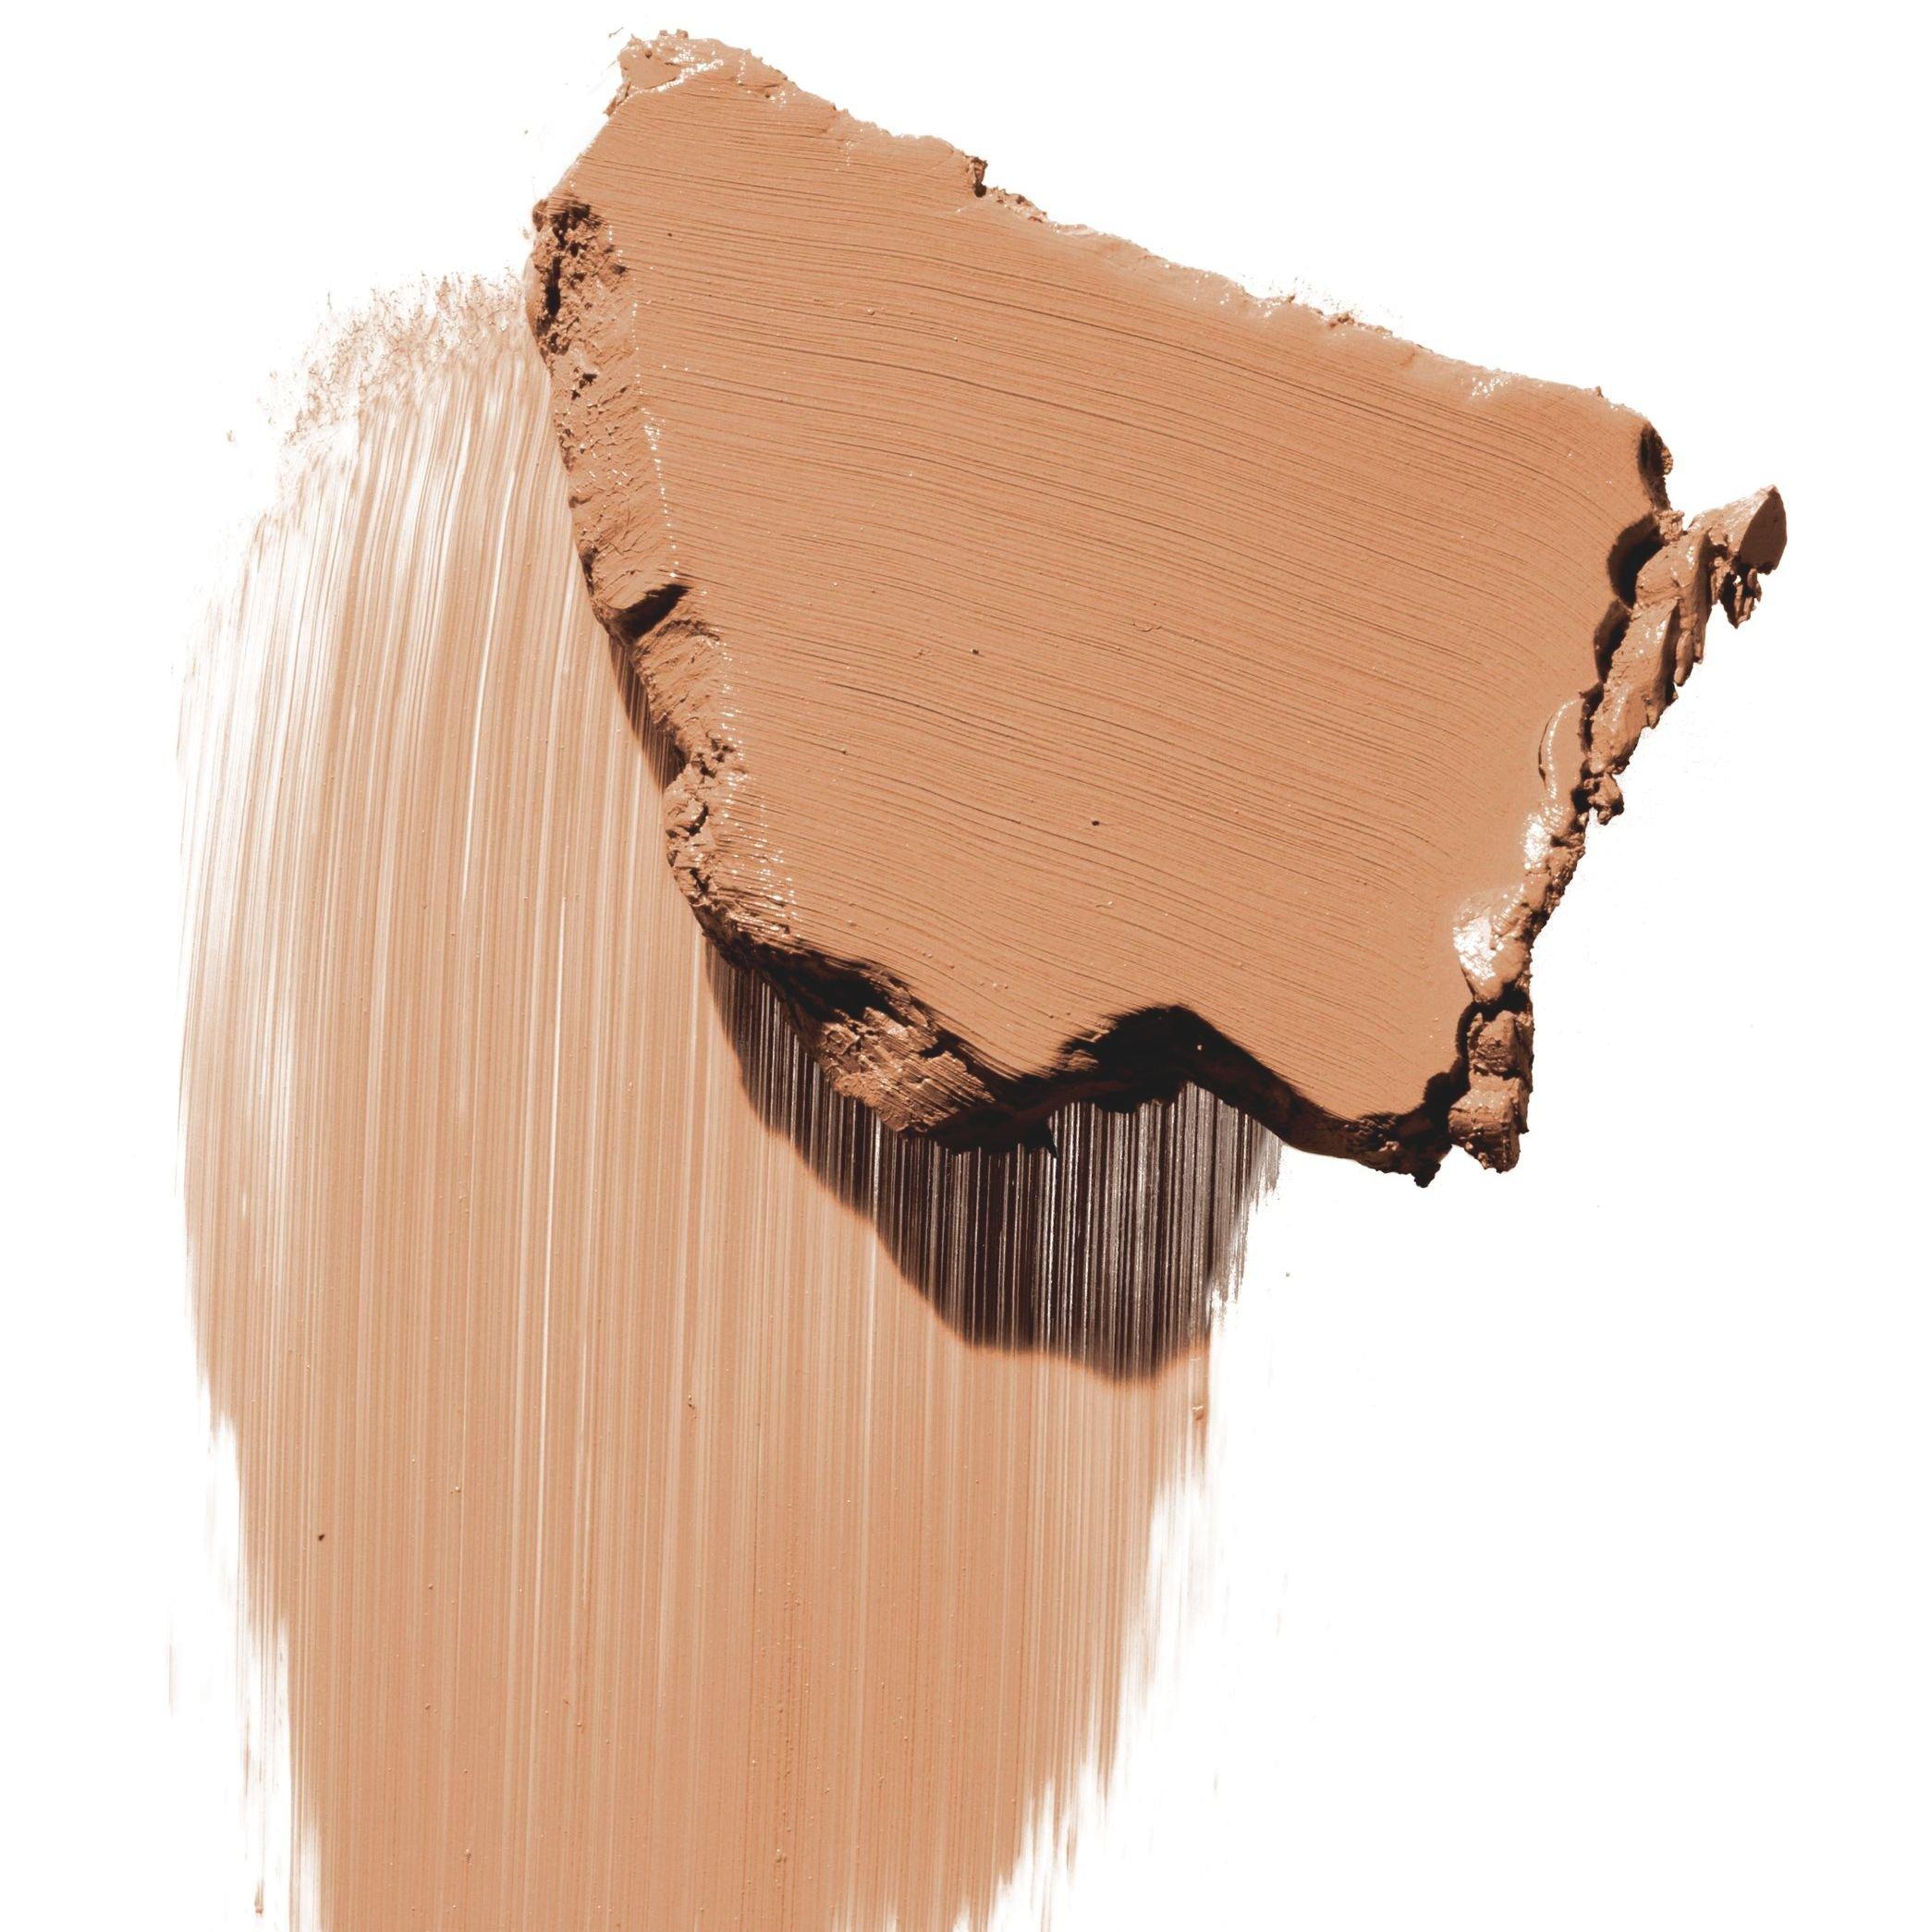 Elizabeth Arden Flawless Finish Sponge On Cream Makeup Softly Beige